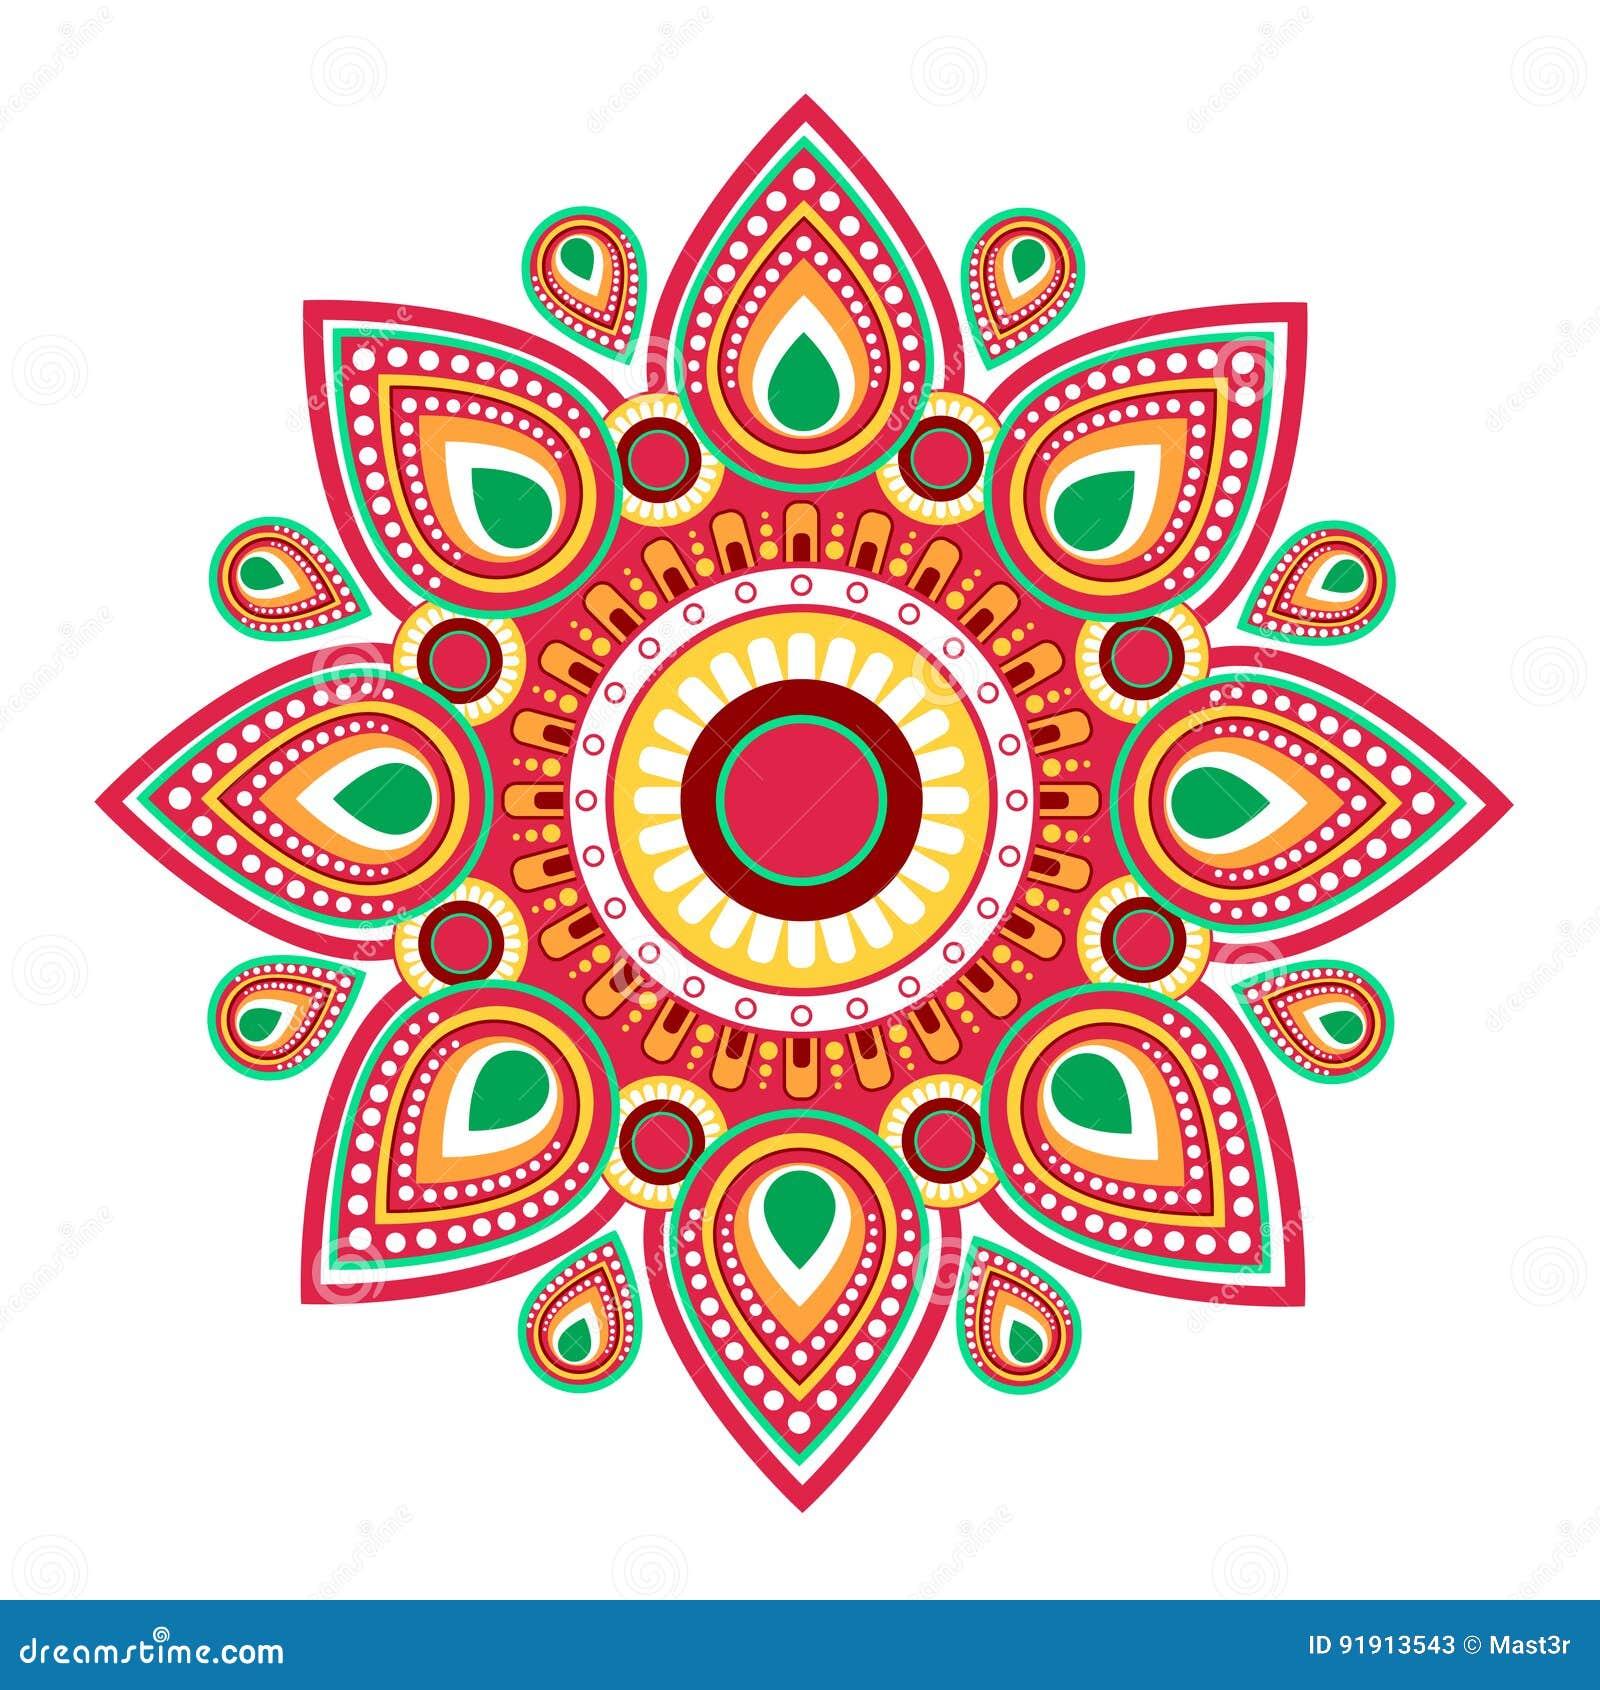 Happy ugadi gudi padwa hindu new year greeting card holiday stock happy ugadi gudi padwa hindu new year greeting card holiday m4hsunfo